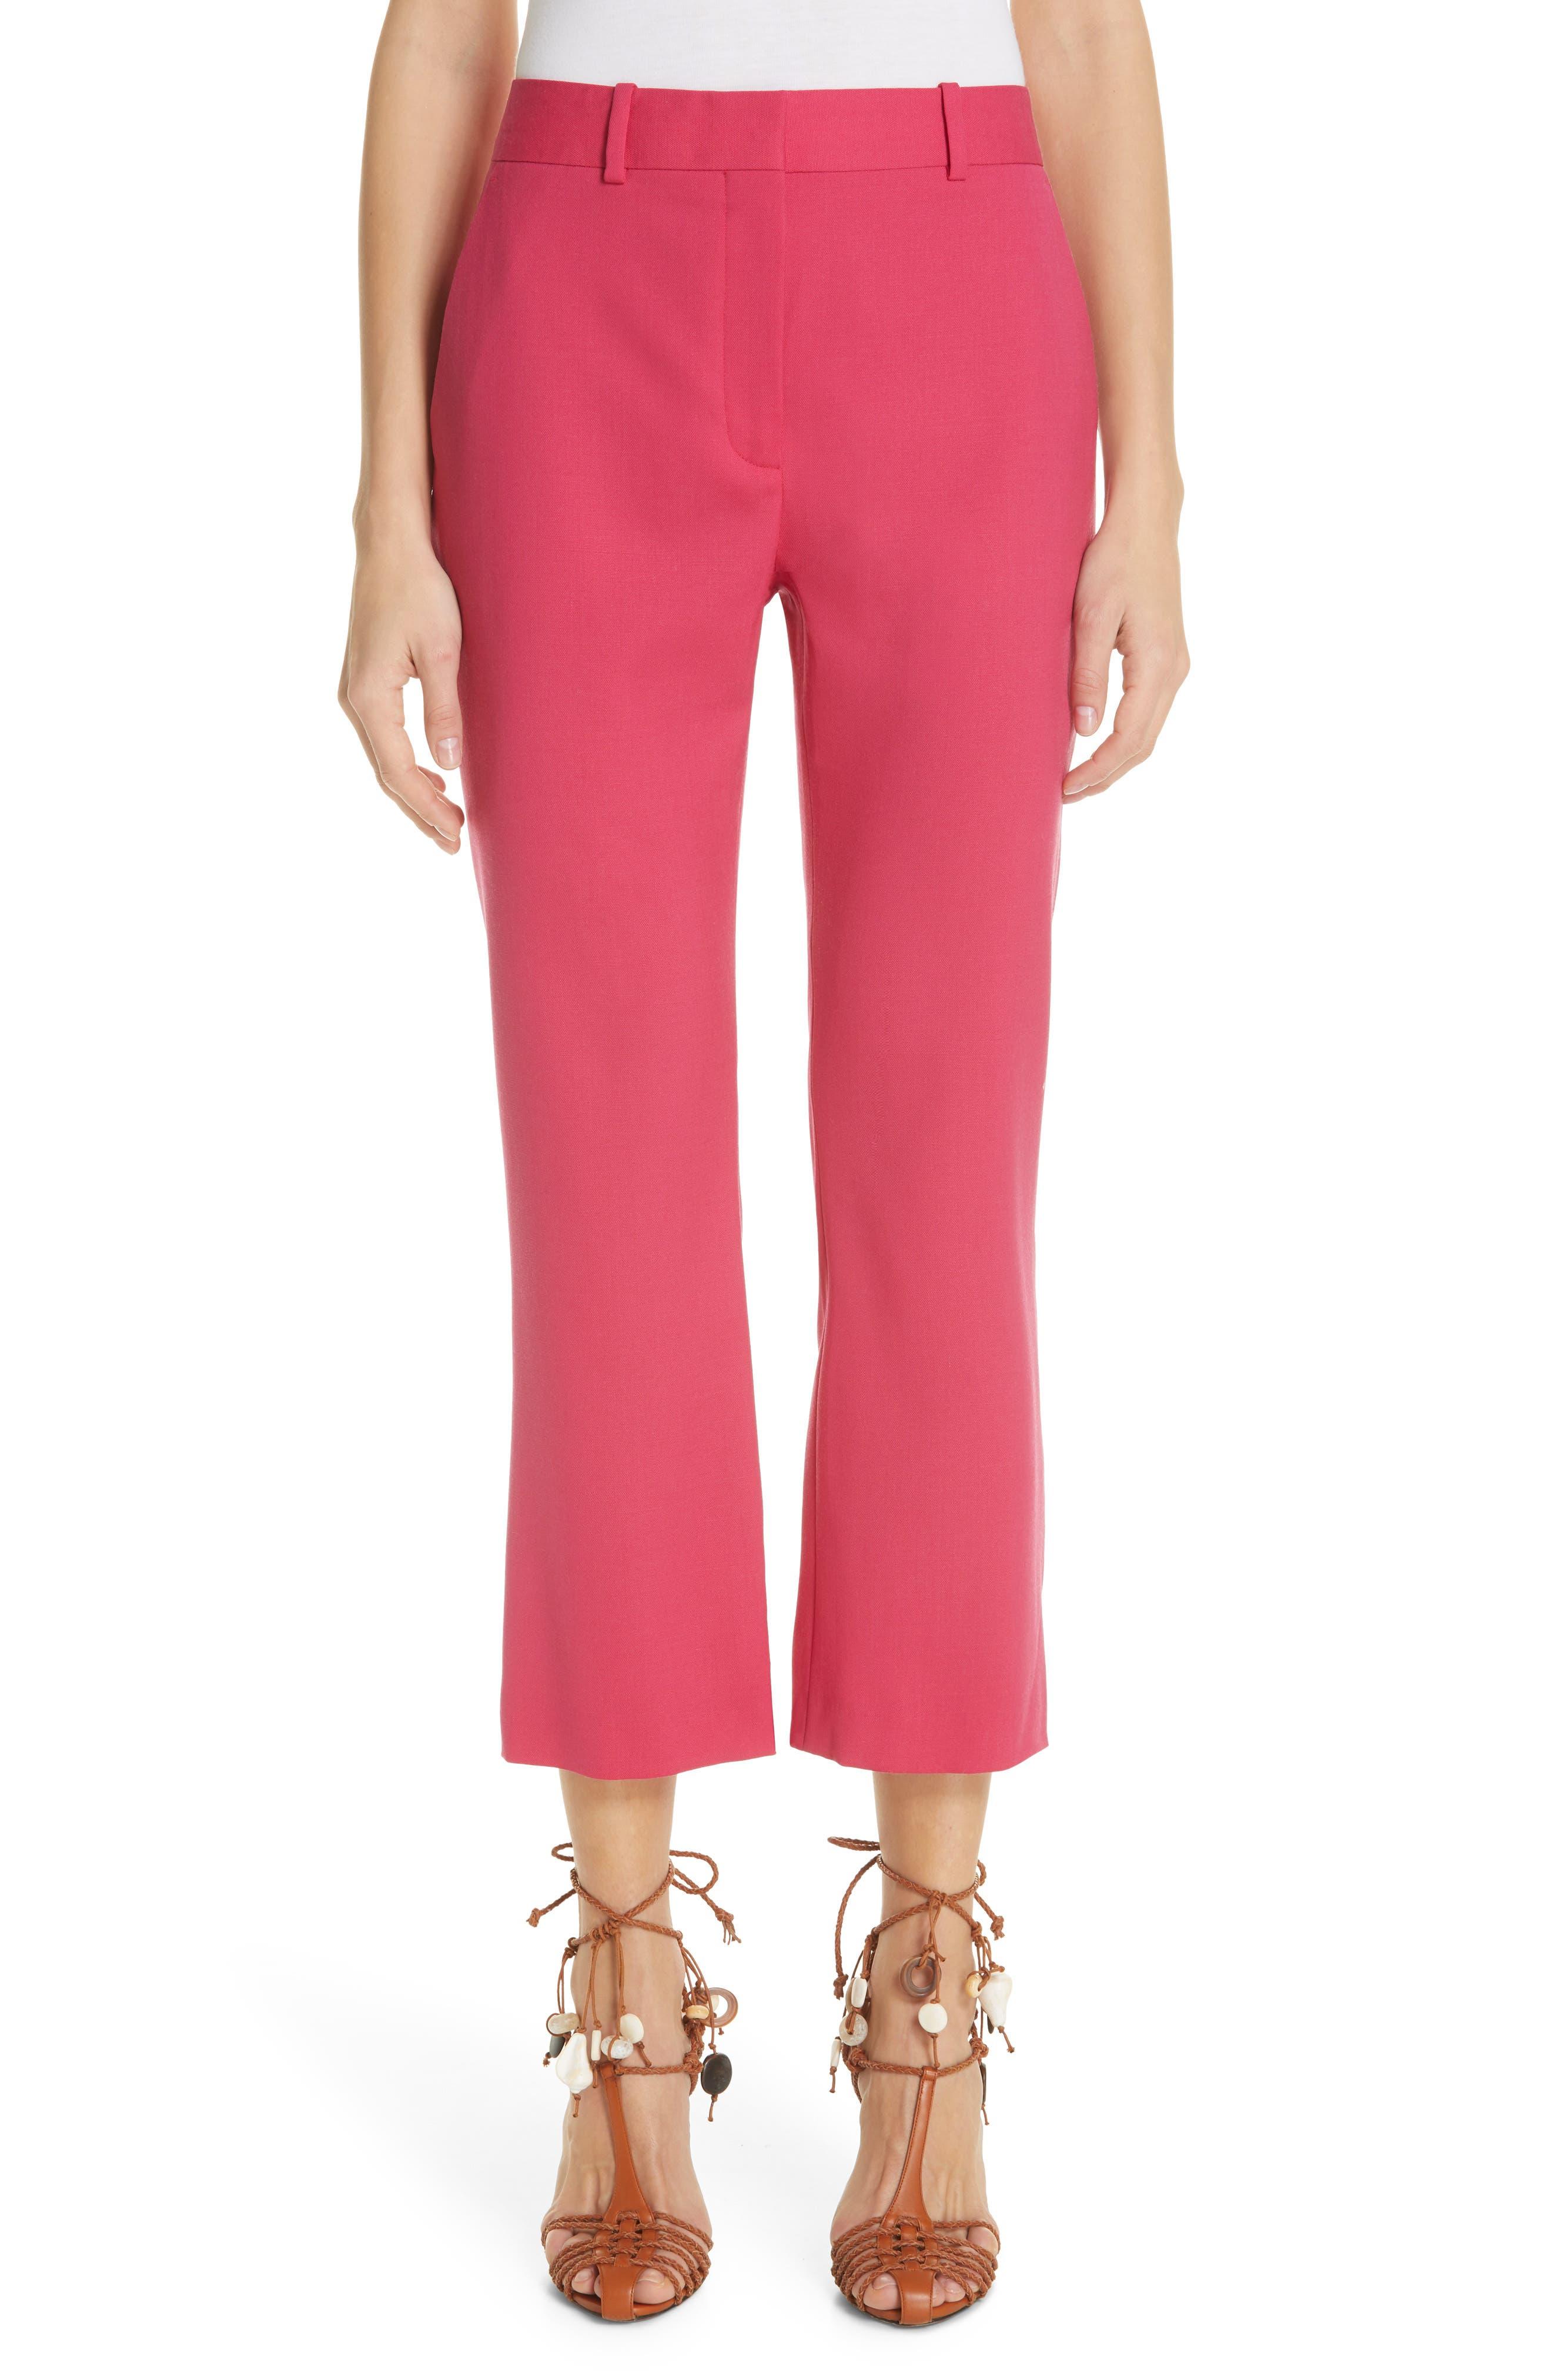 Altuzarra Flare Leg Crop Pants, US / 40 FR - Pink